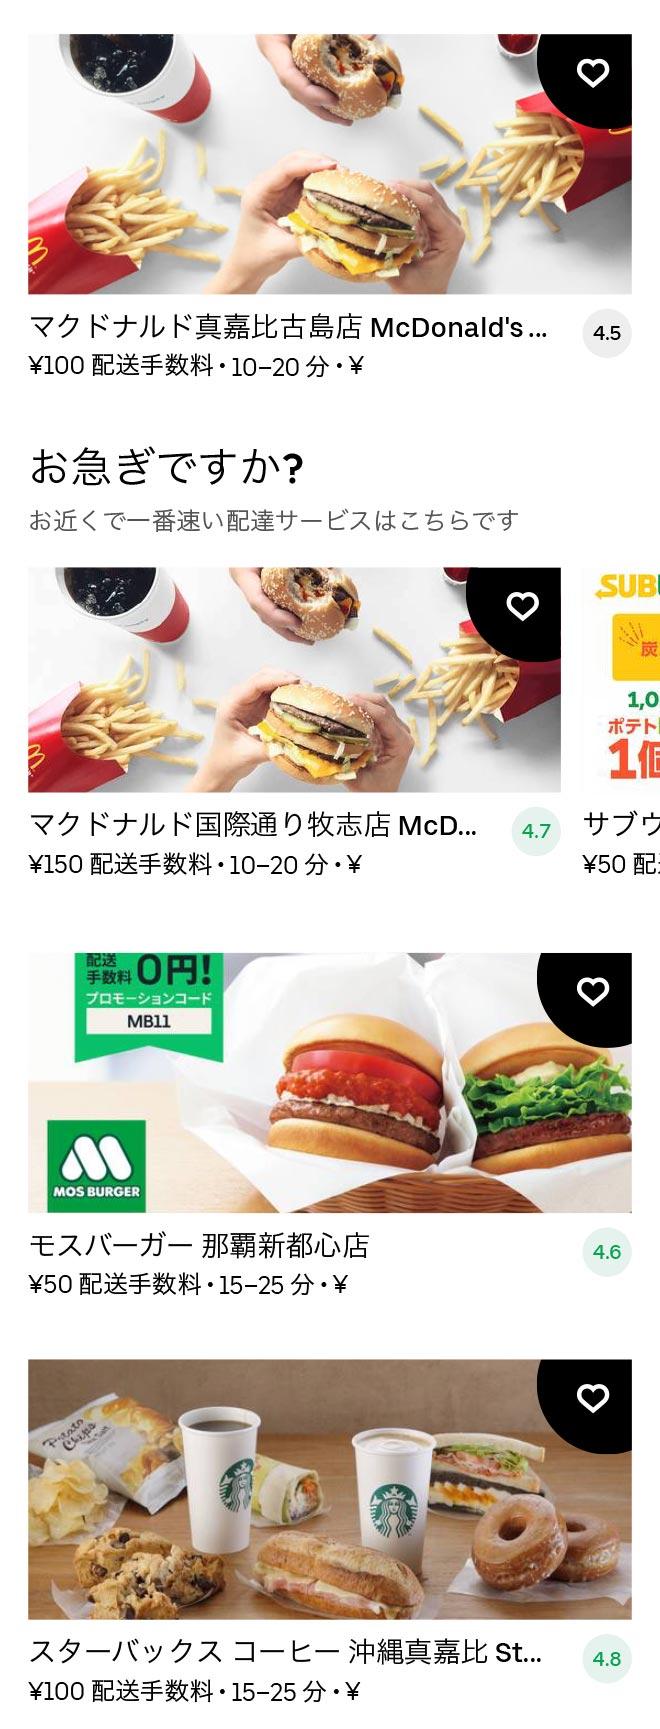 Omoromachi menu 2011 01